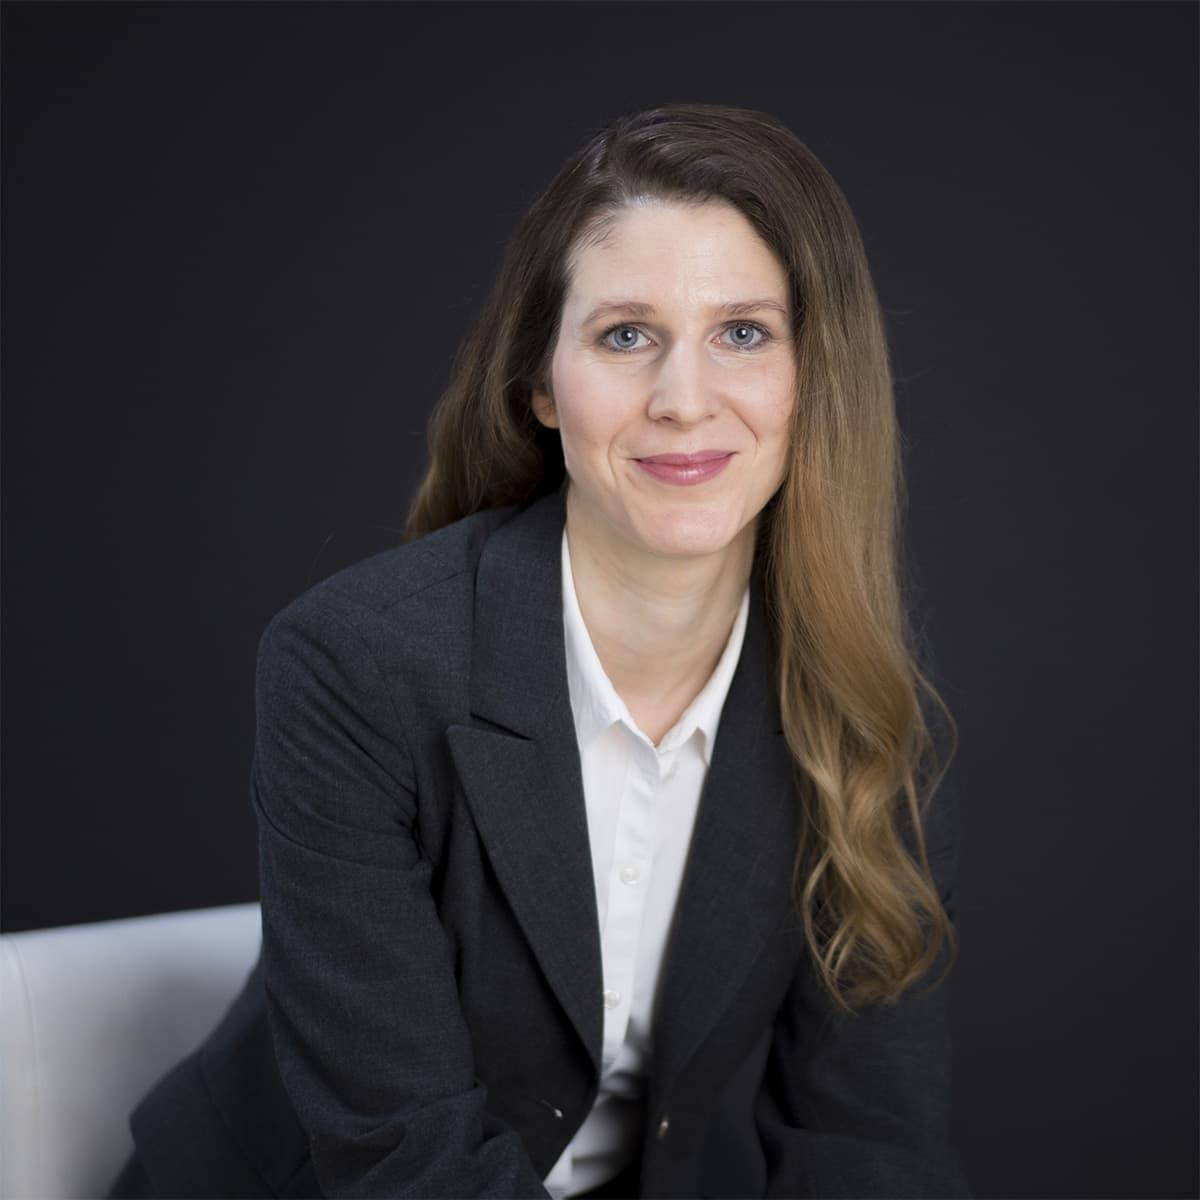 Kanzlei Kranich Berlin - Rechtsanwältin Iris Kalefeld